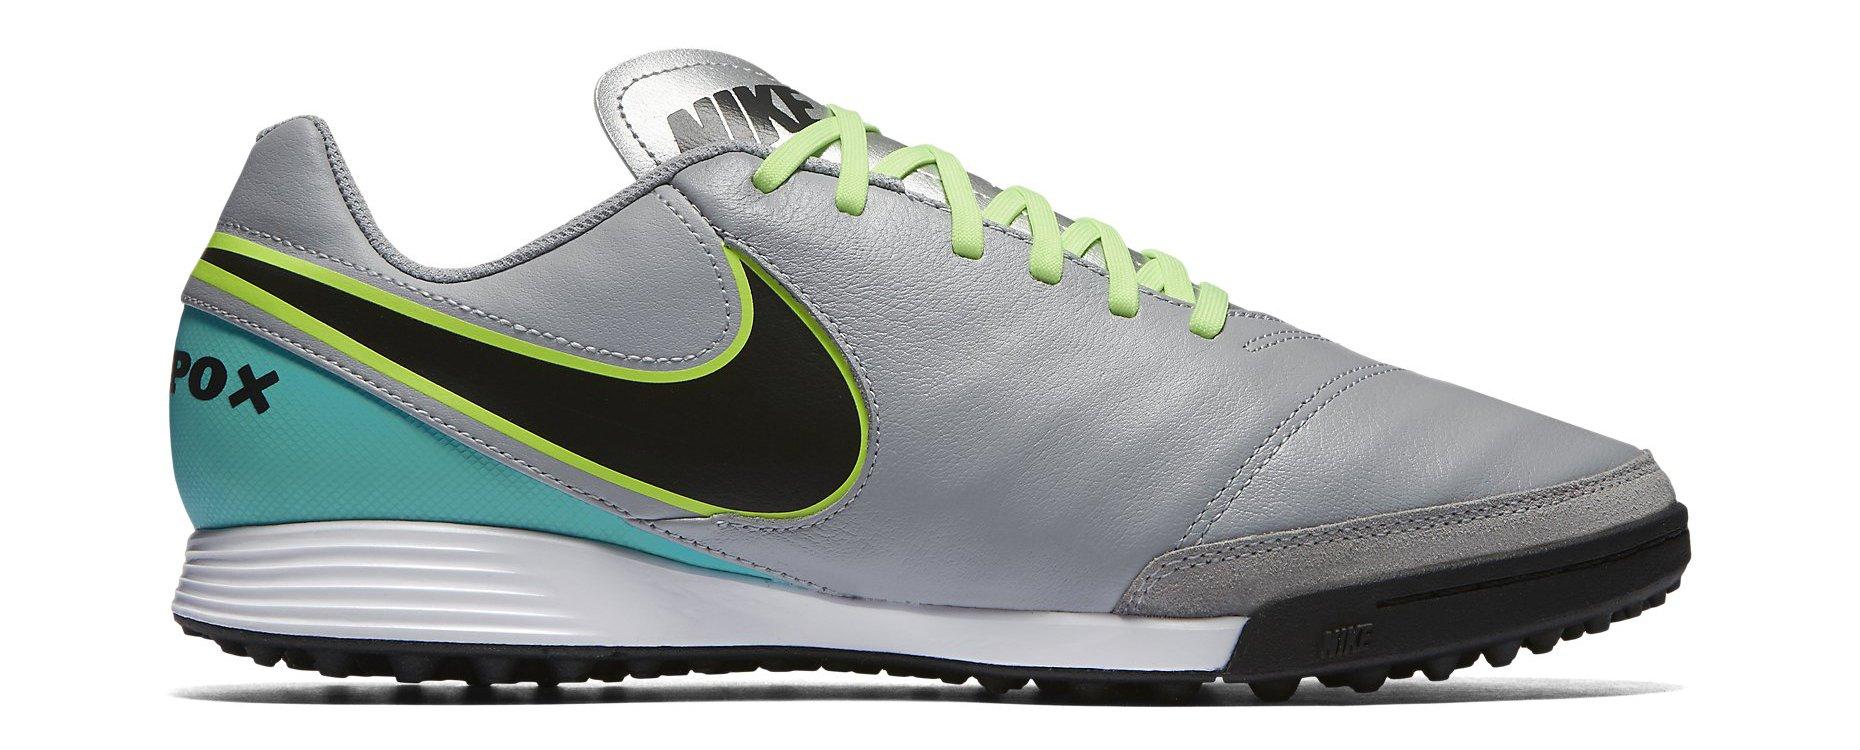 Kopačky Nike Tiempo Genio II Leather TF